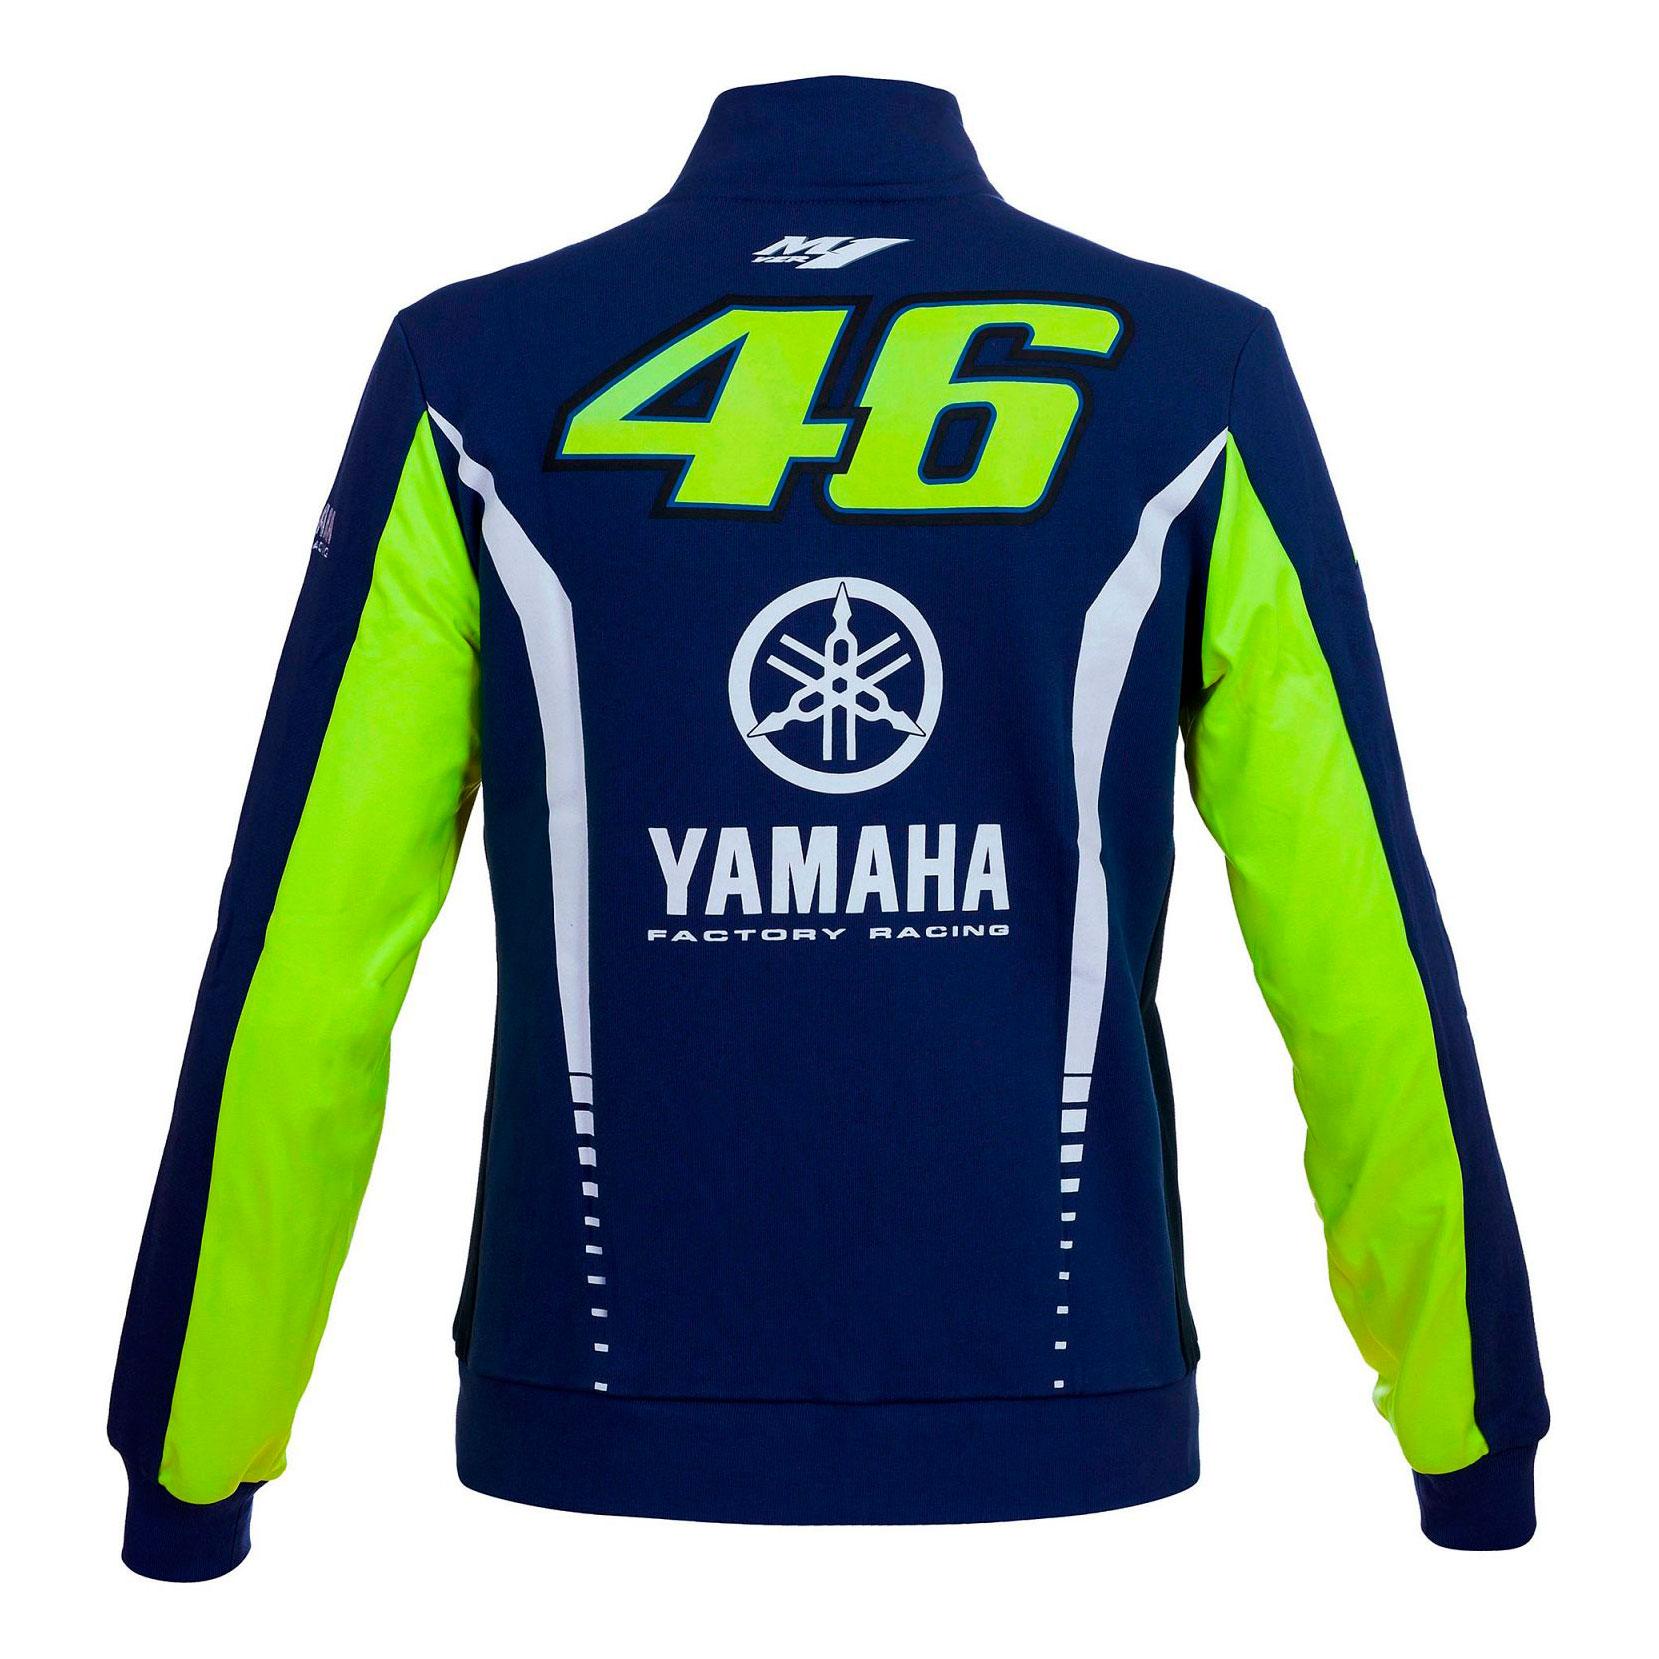 Motorbike Vr46 En 2017 Mujer Sudadera Yamaha Oficial Valentino Rossi q6x88Tgt